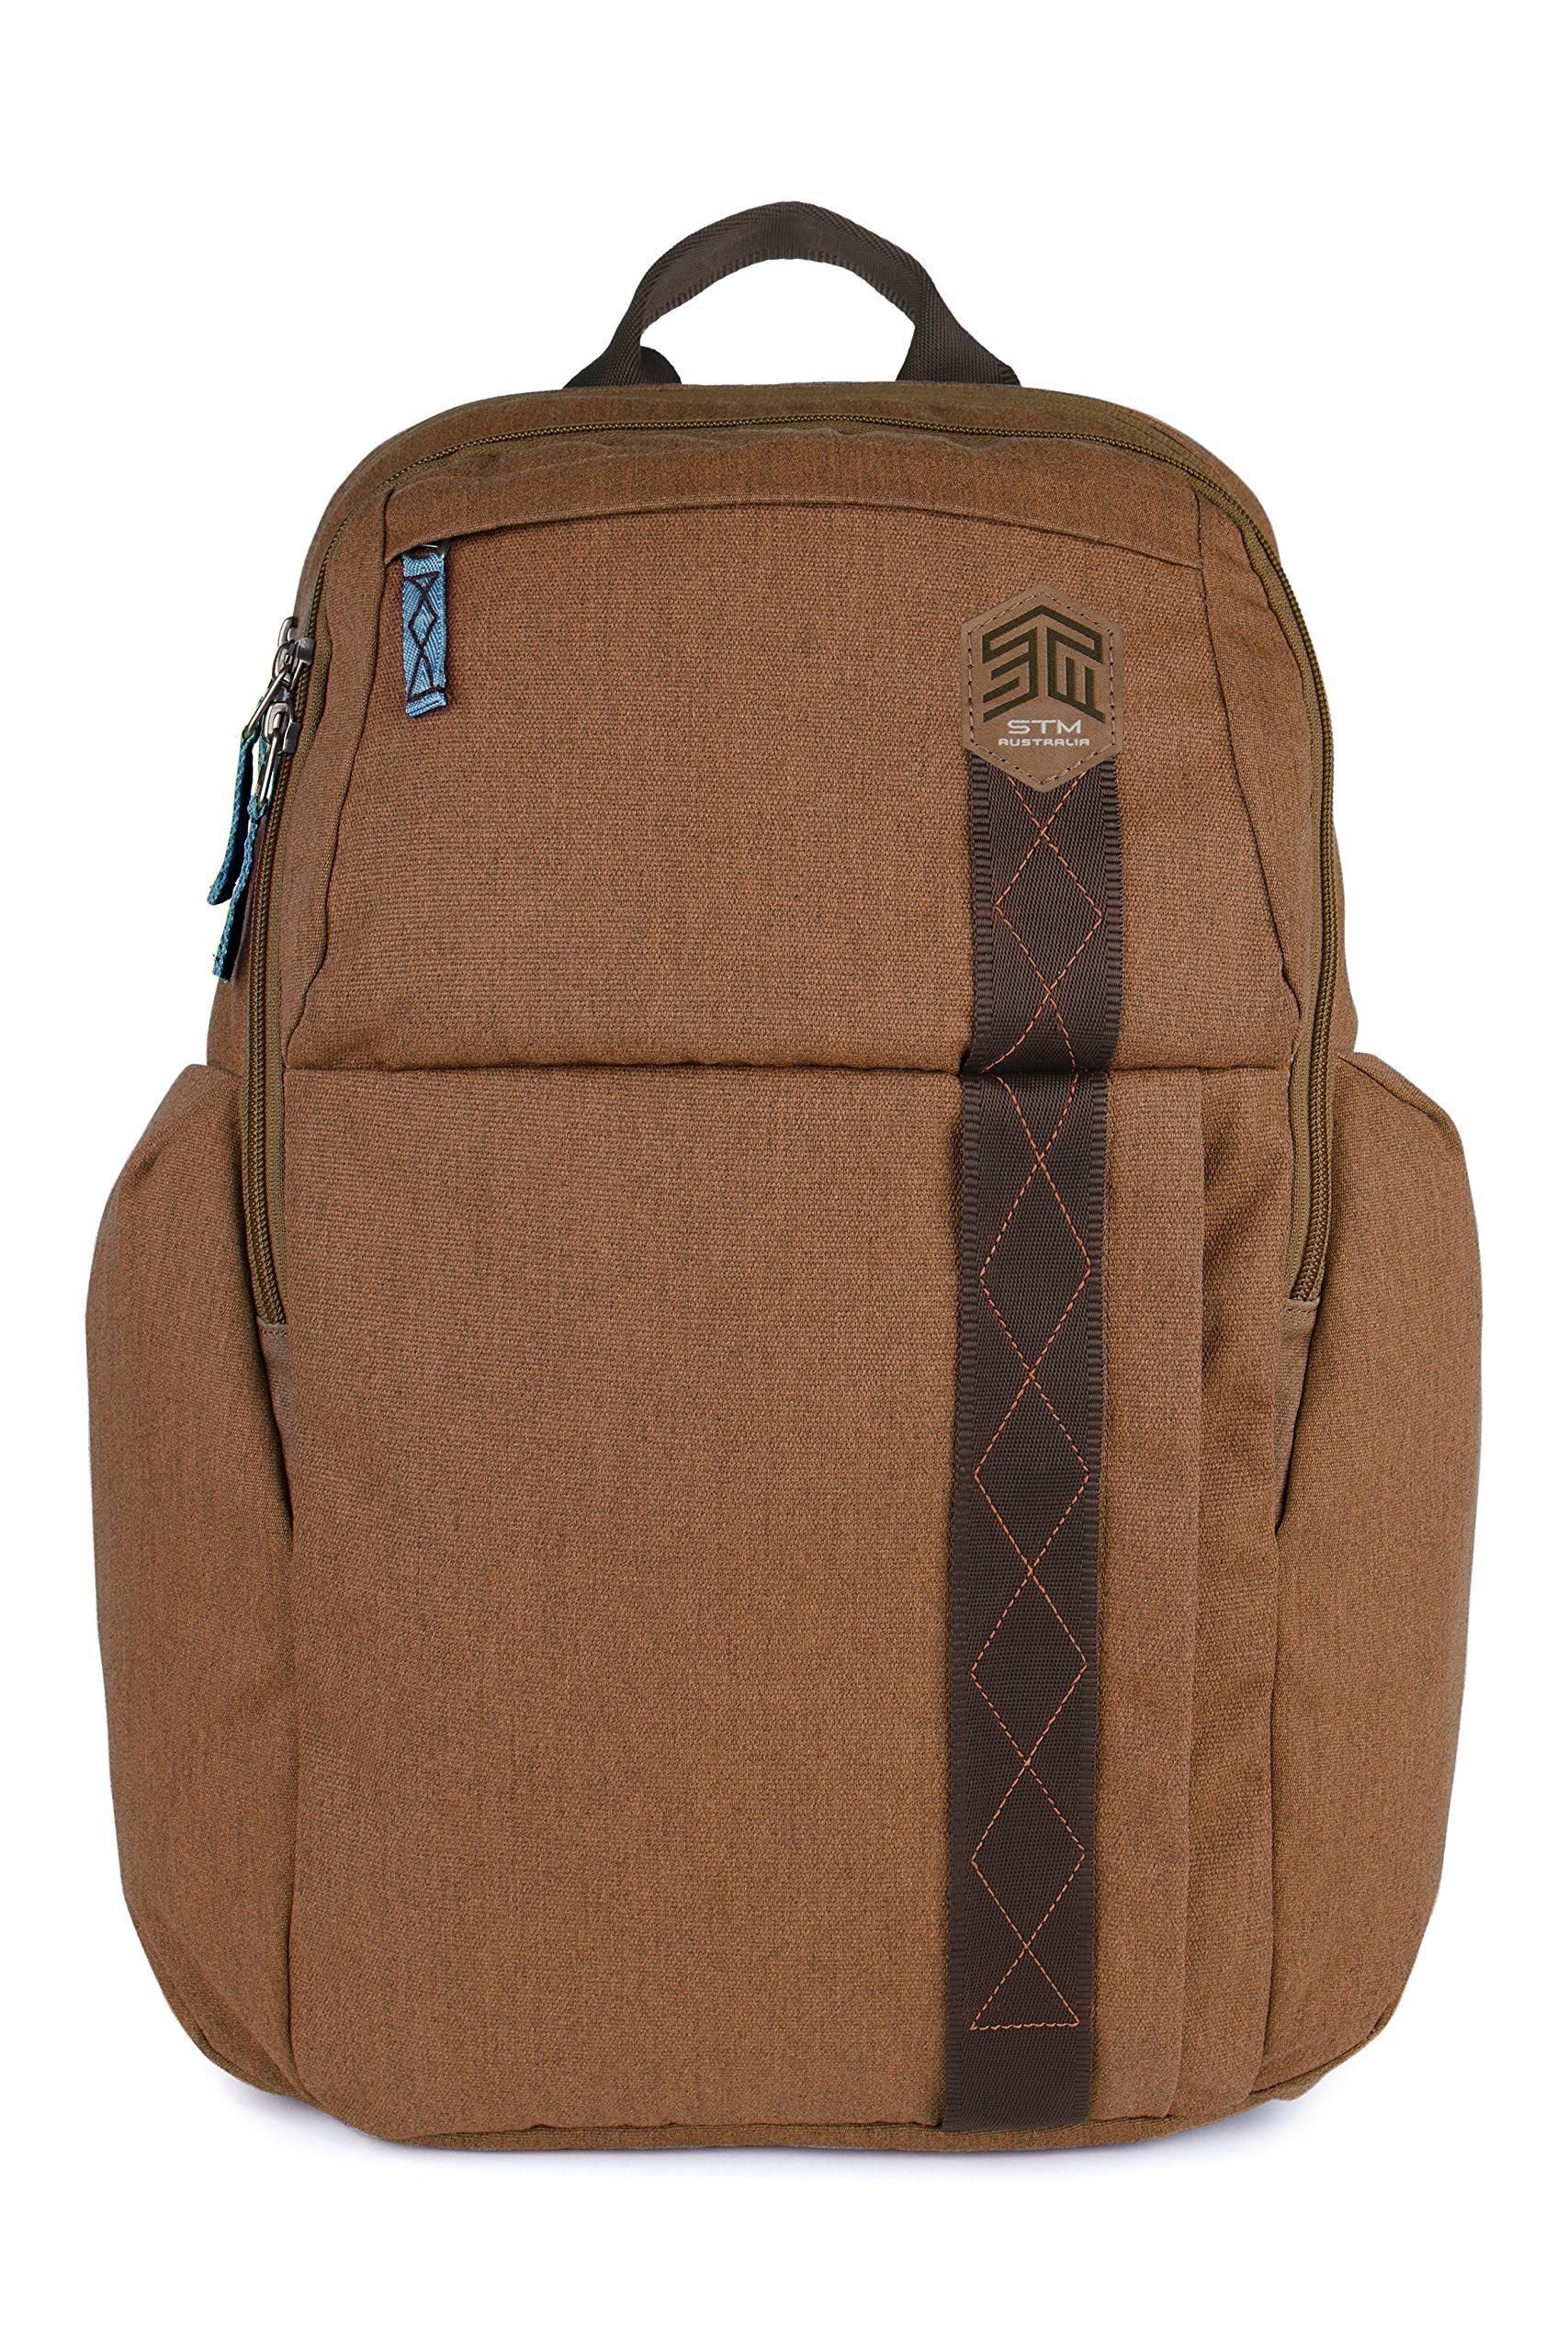 STM Kings Backpack For Laptop & Tablet Up To 15'' - Desert Brown (stm-111-149P-10) by STM (Image #2)